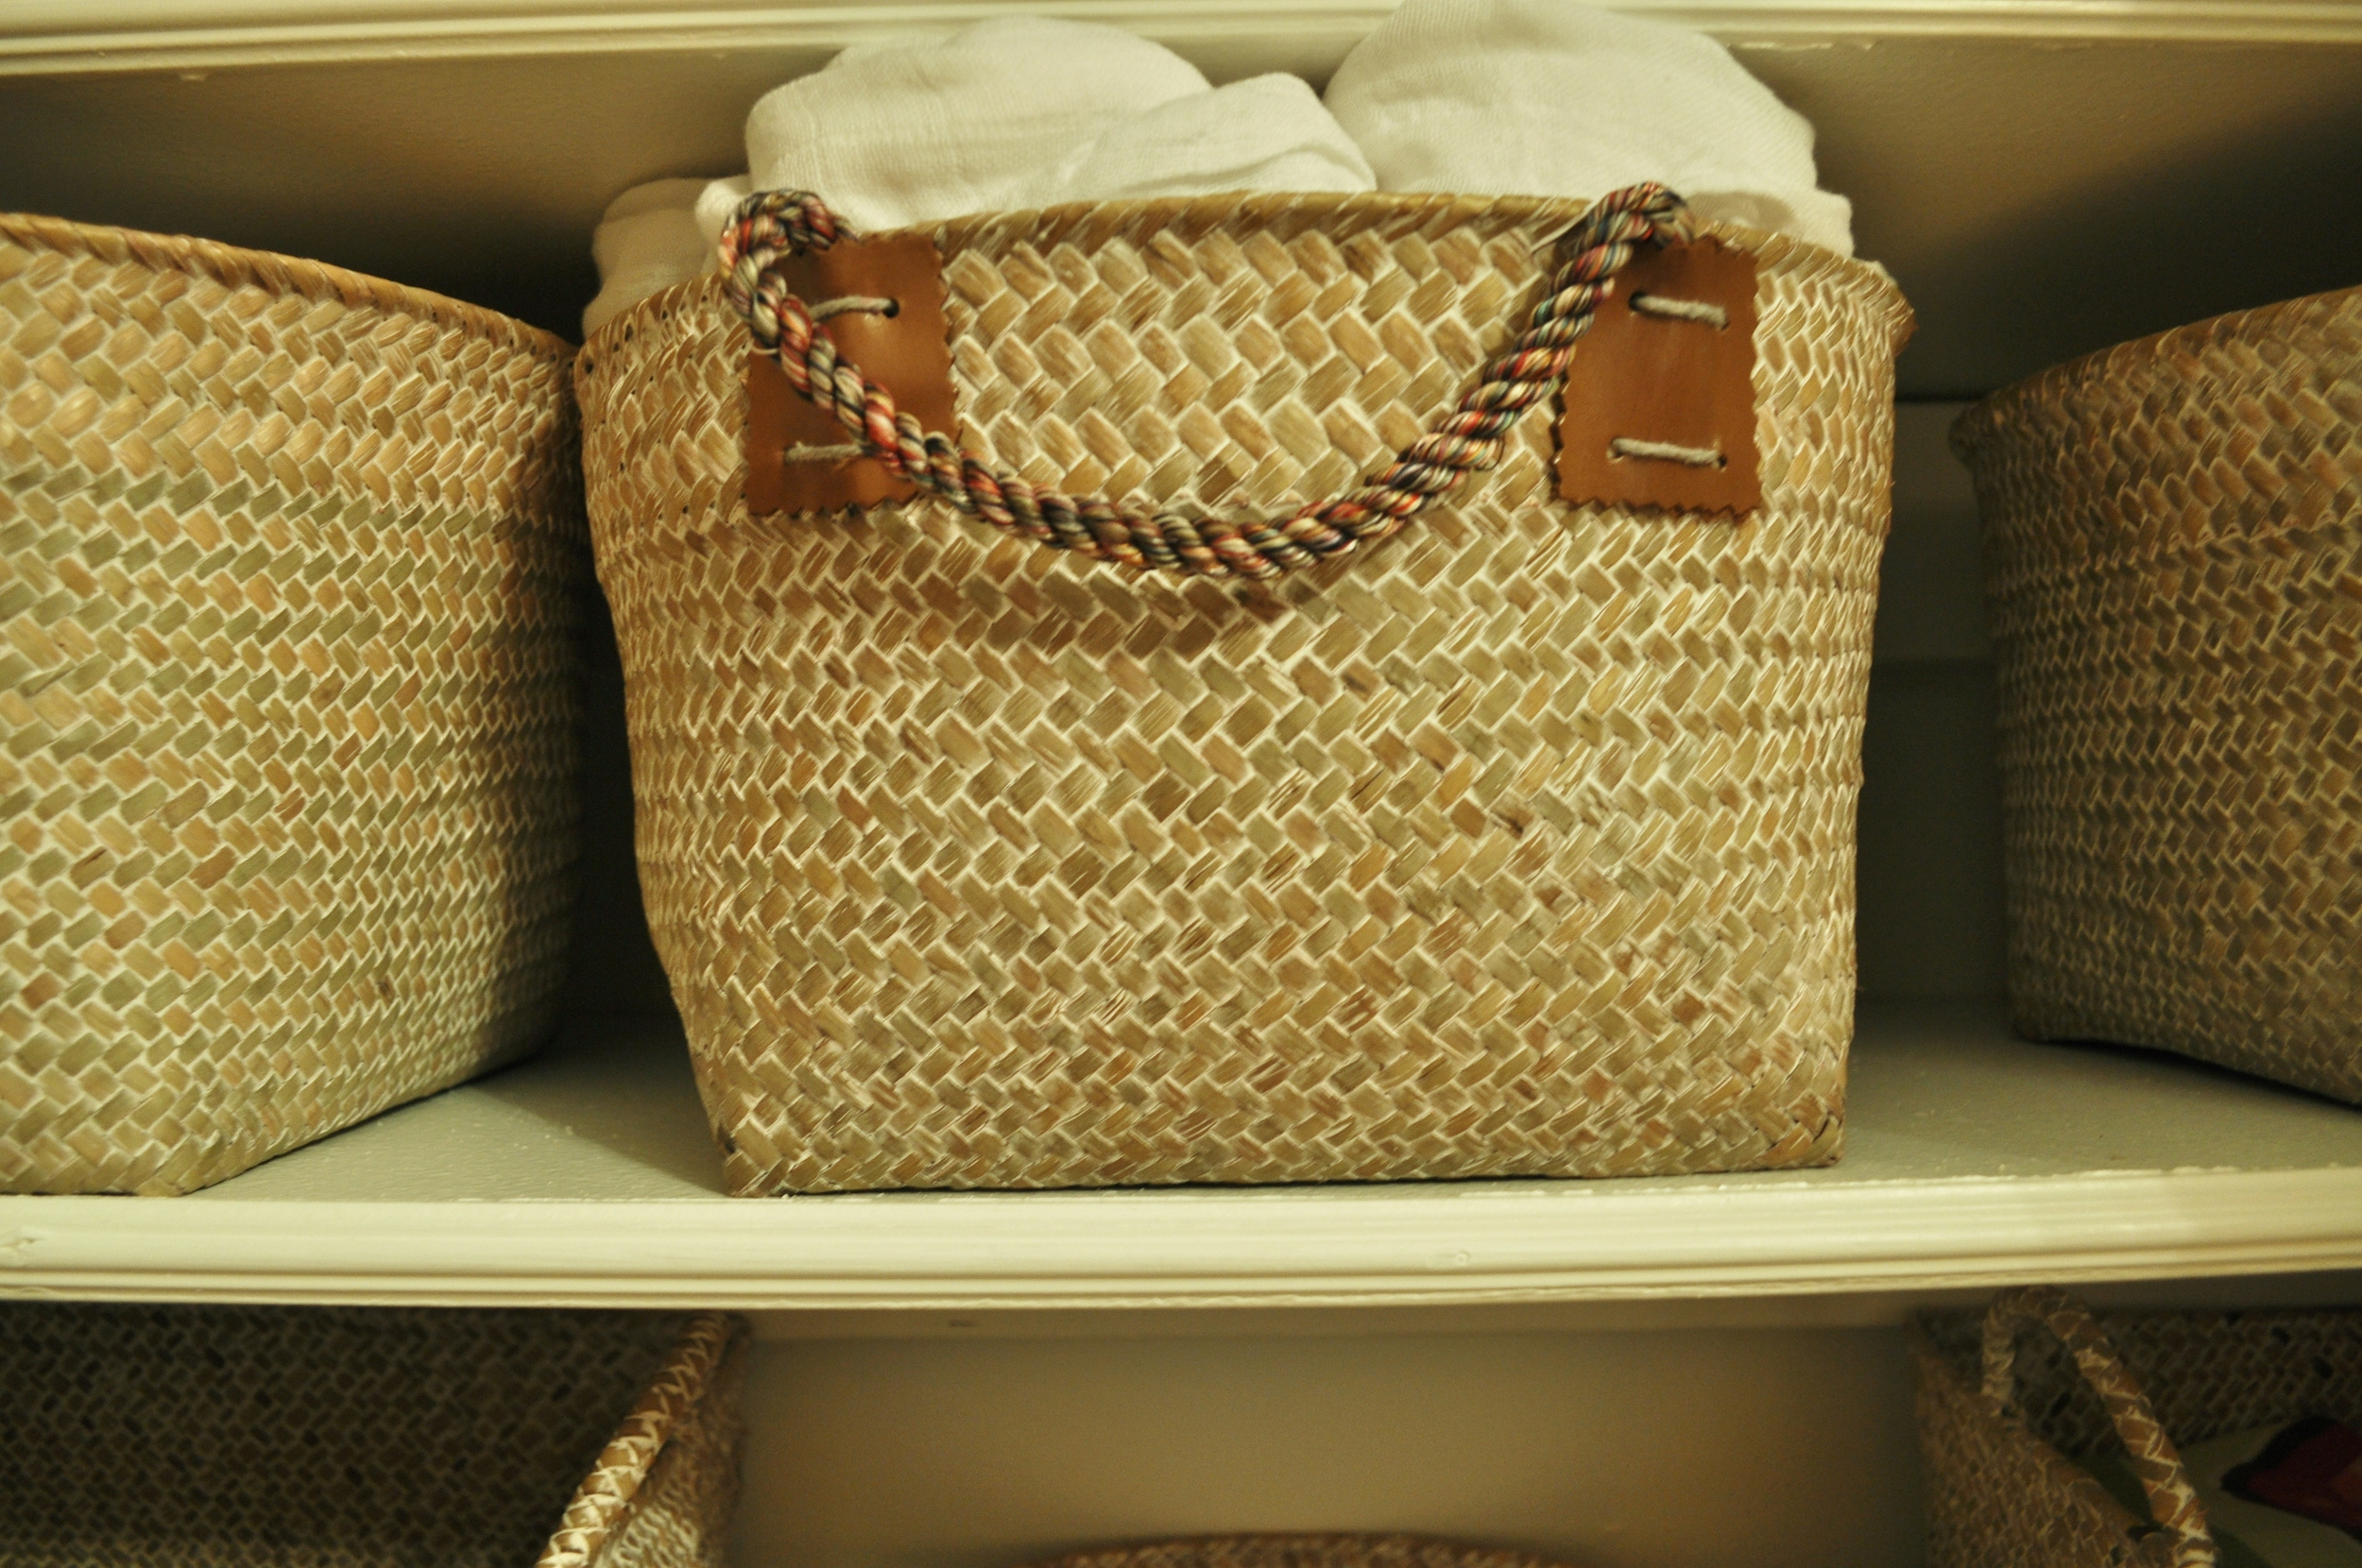 Straw Basket for Blankets